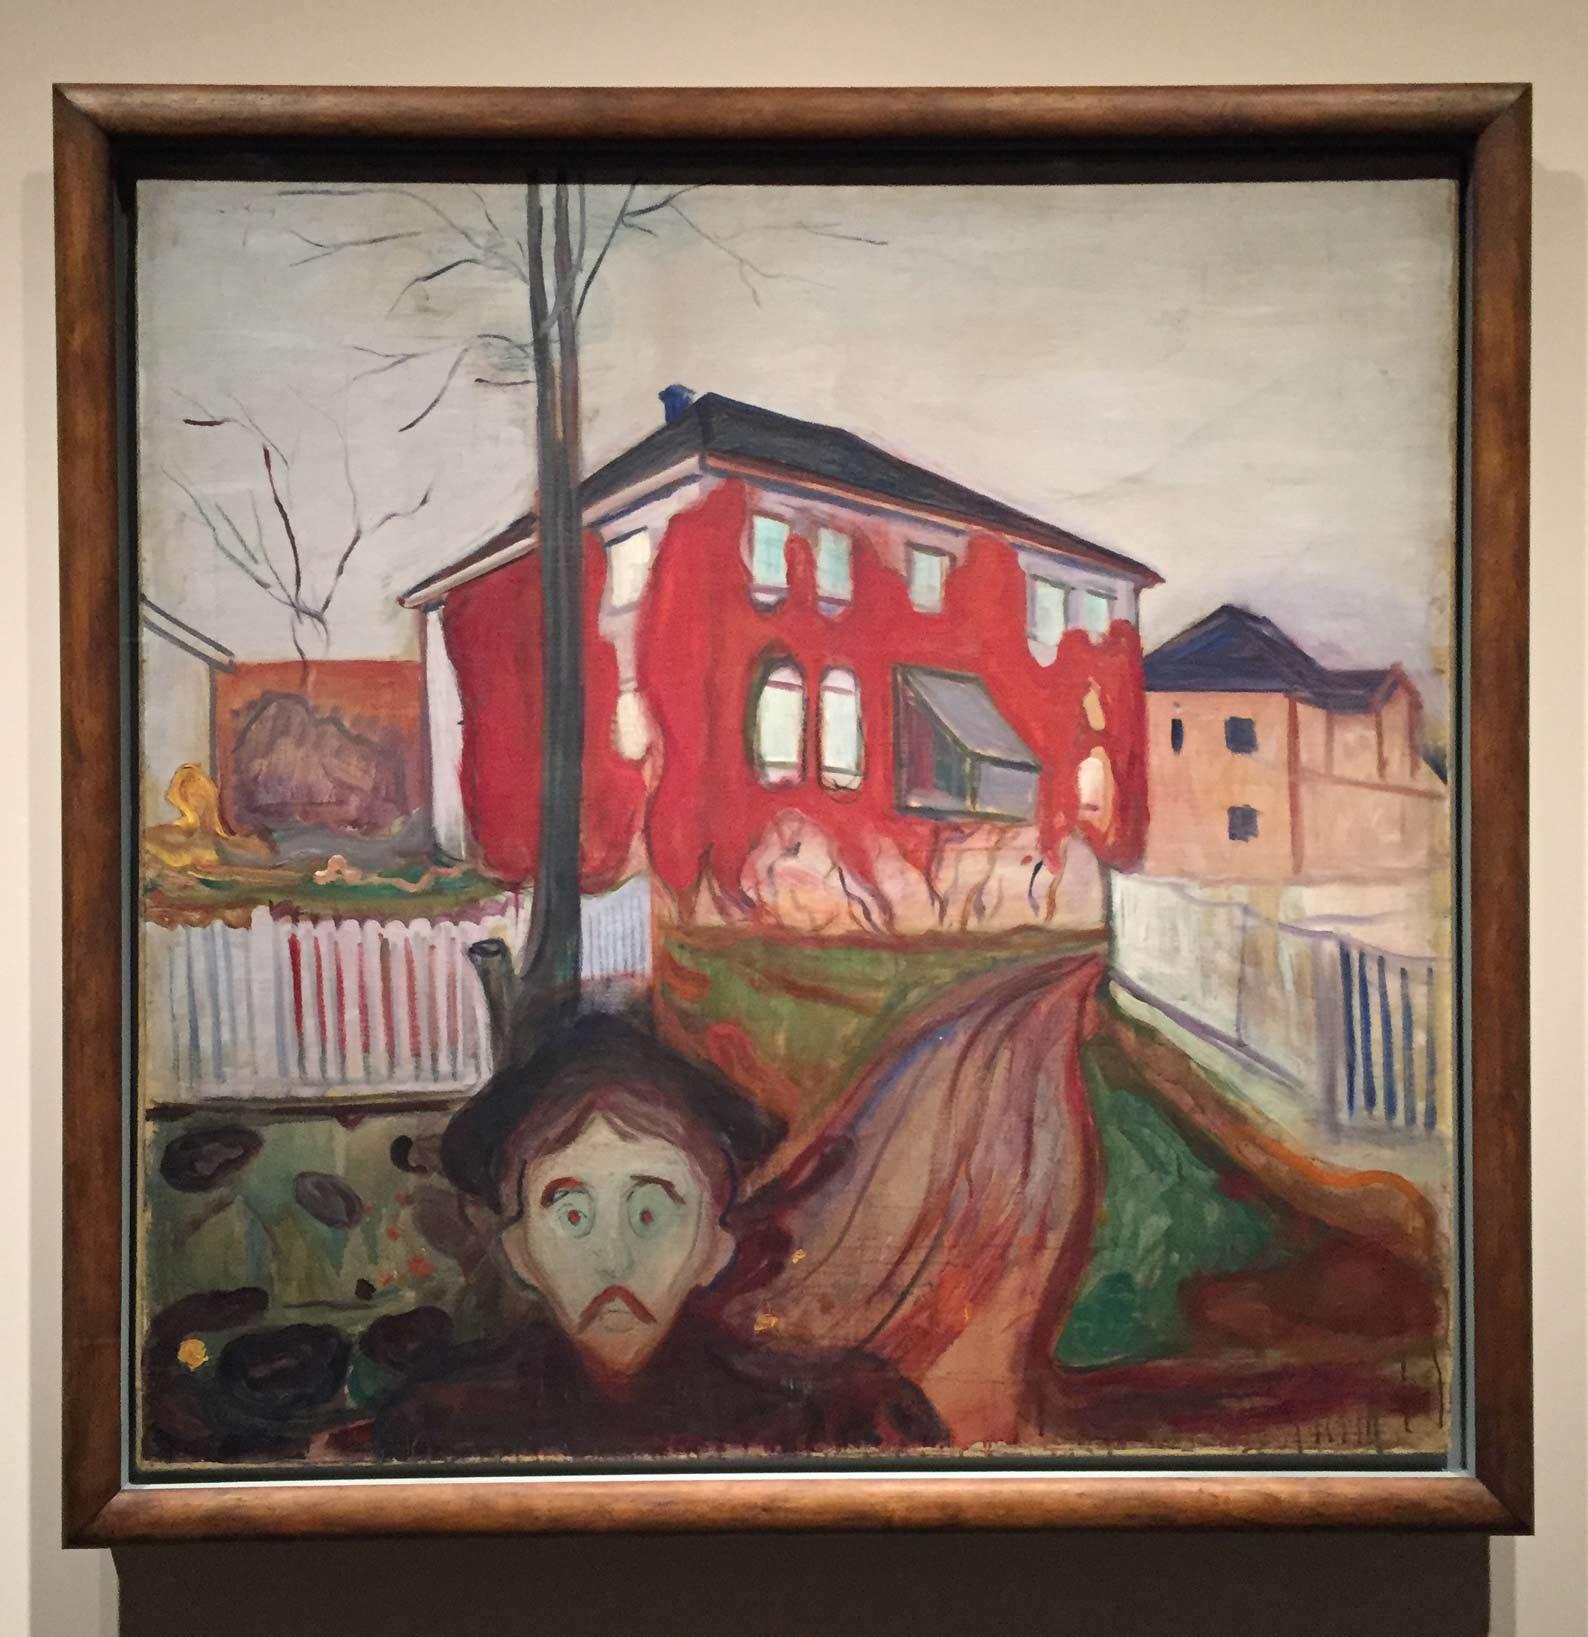 Edvard-Munch-Red-Virginia-Creeper-1898-1900-Munch-Museum.jpg